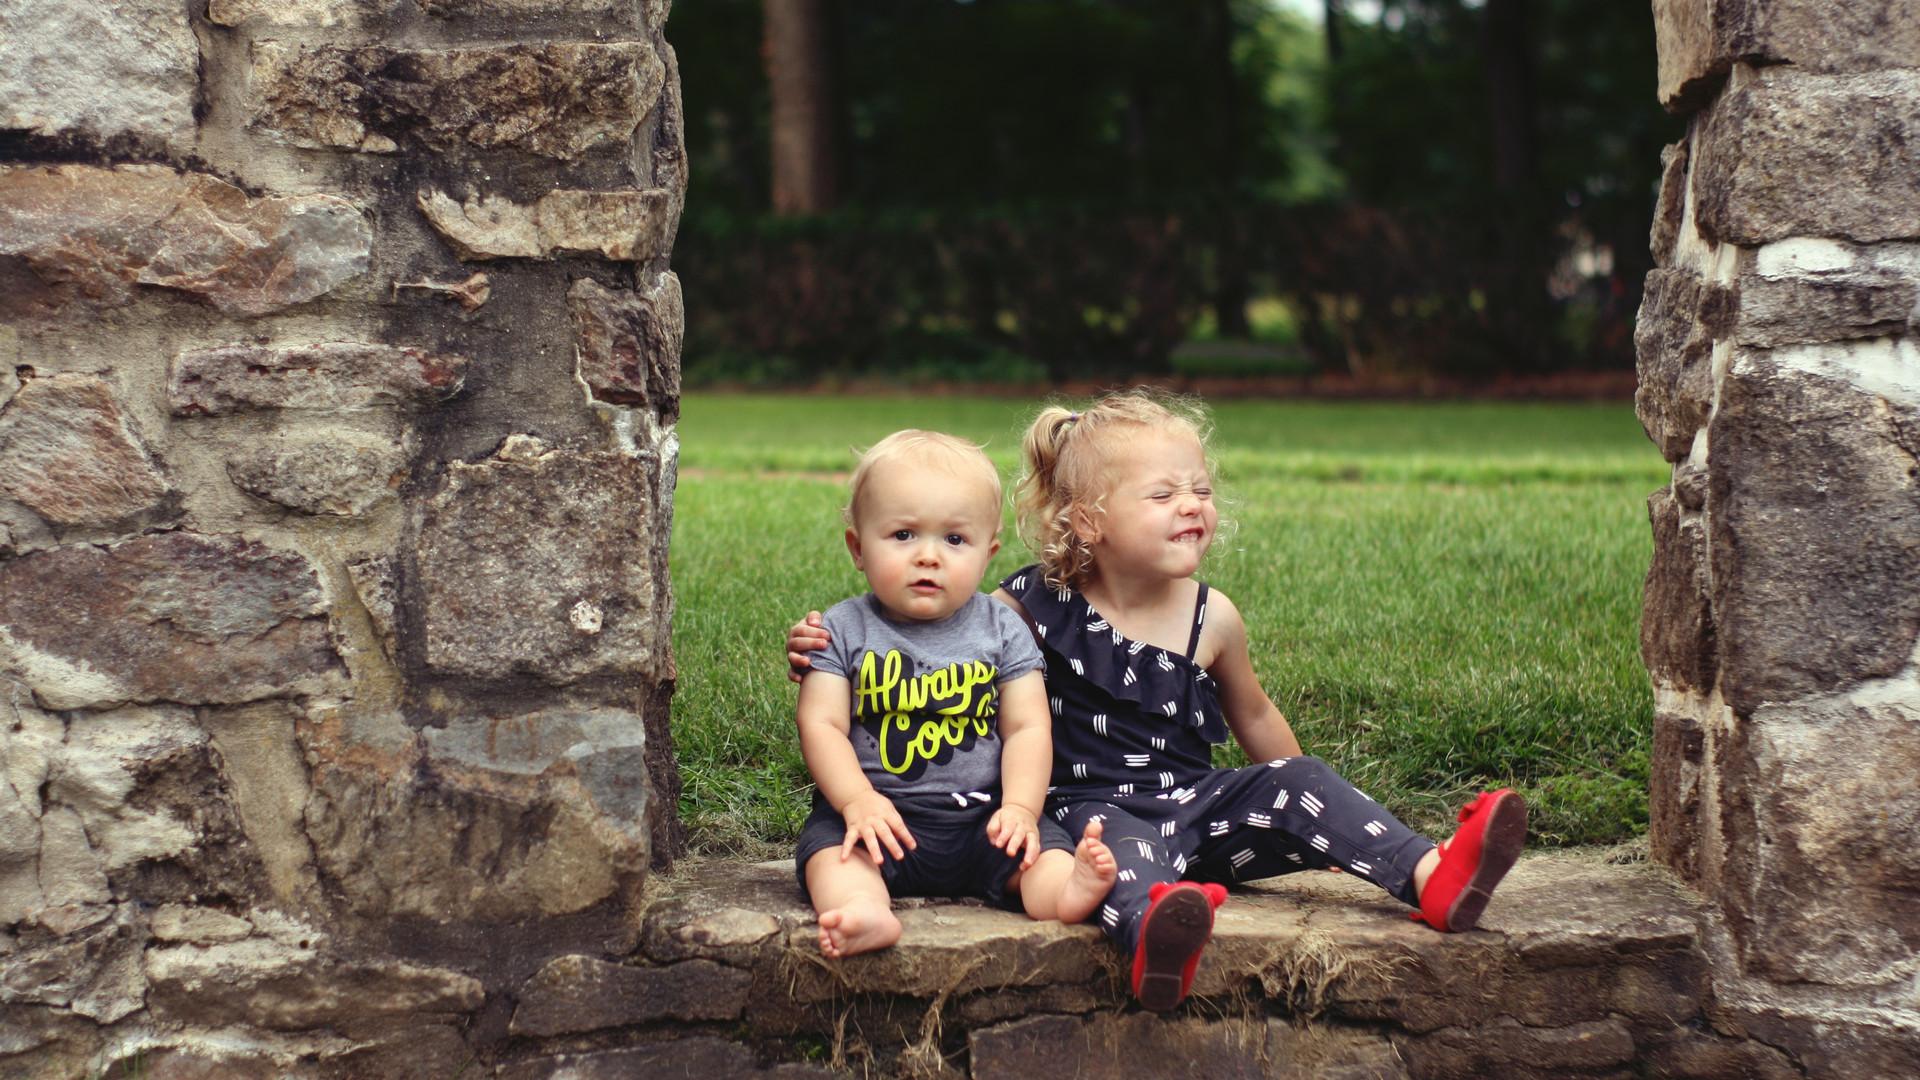 Sibling Portrait Session - Lock Ridge Park, Alburtis, PA